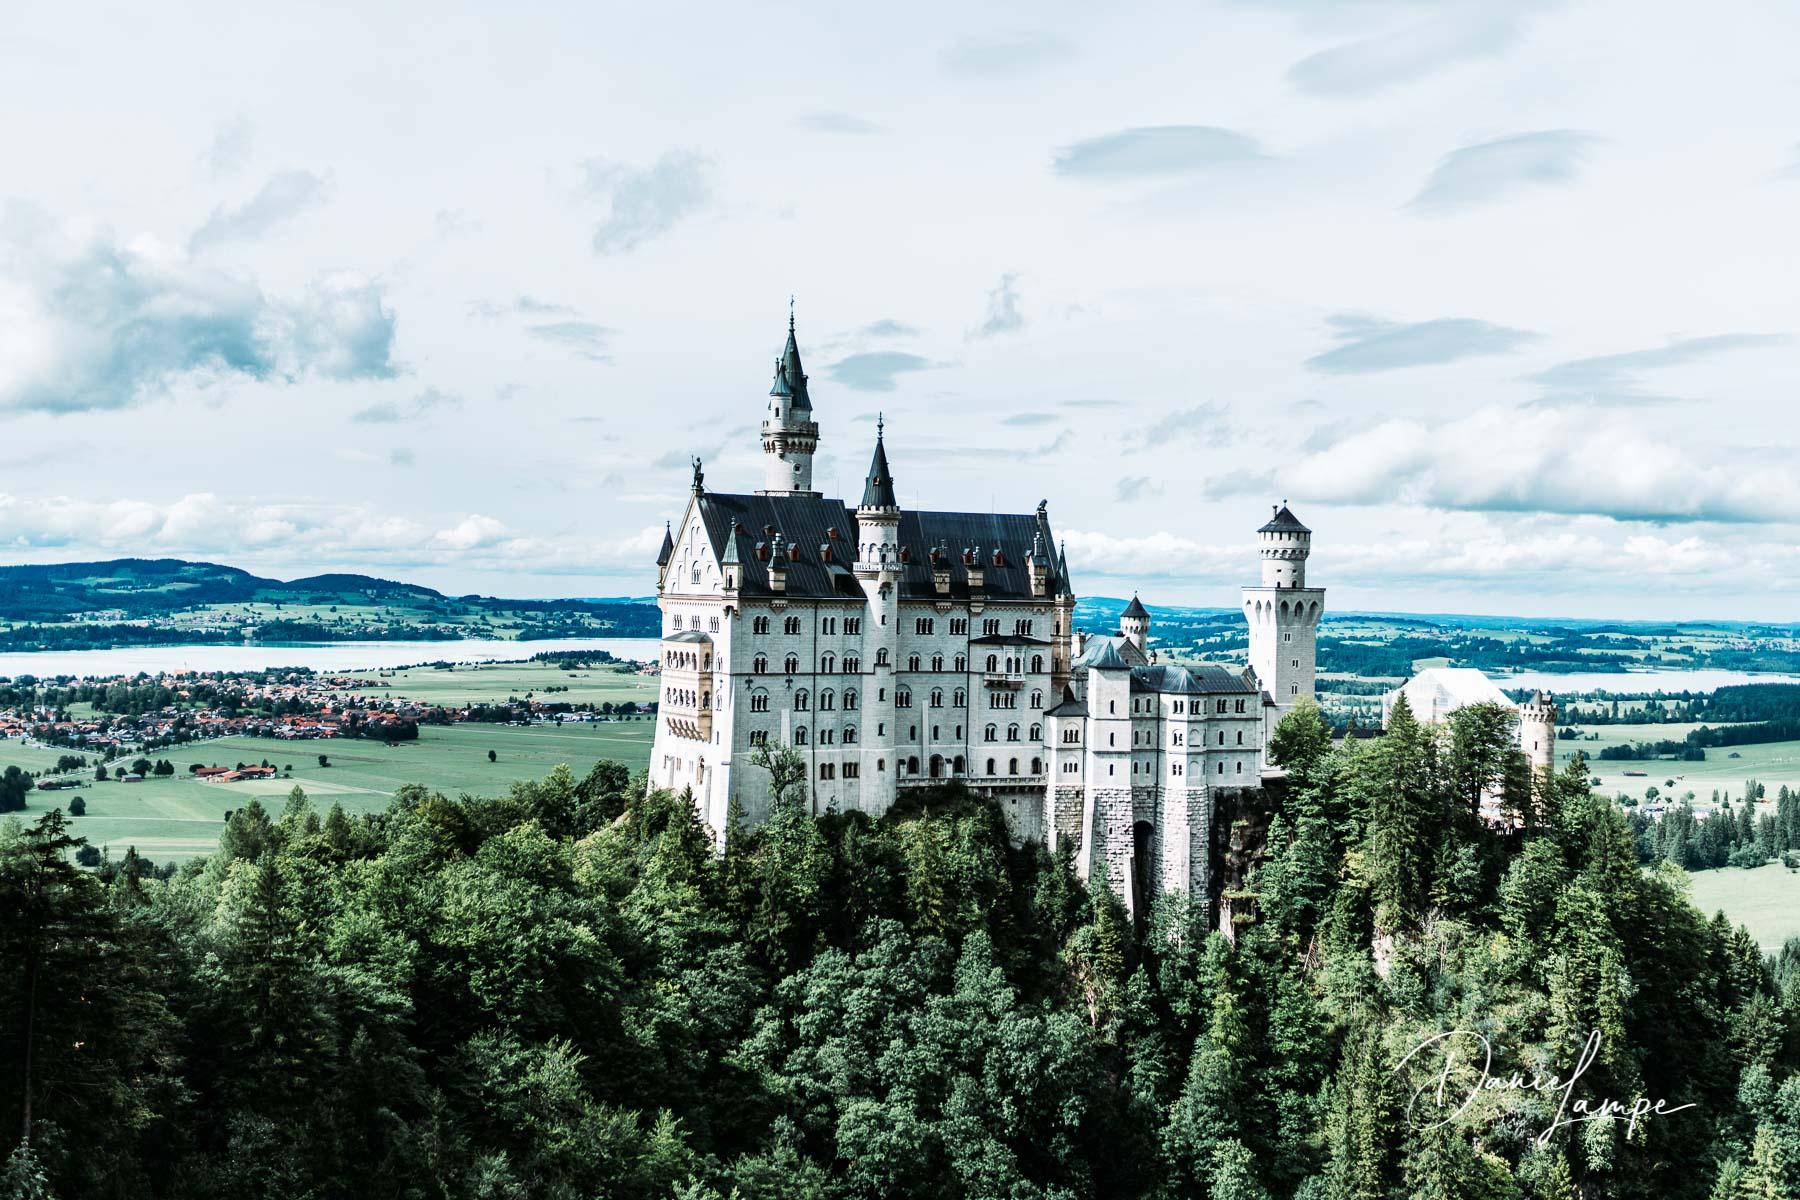 Deutschland, Hohenschwangau, Schloss Neuschwanstein, Schloss, Neuschwanstein